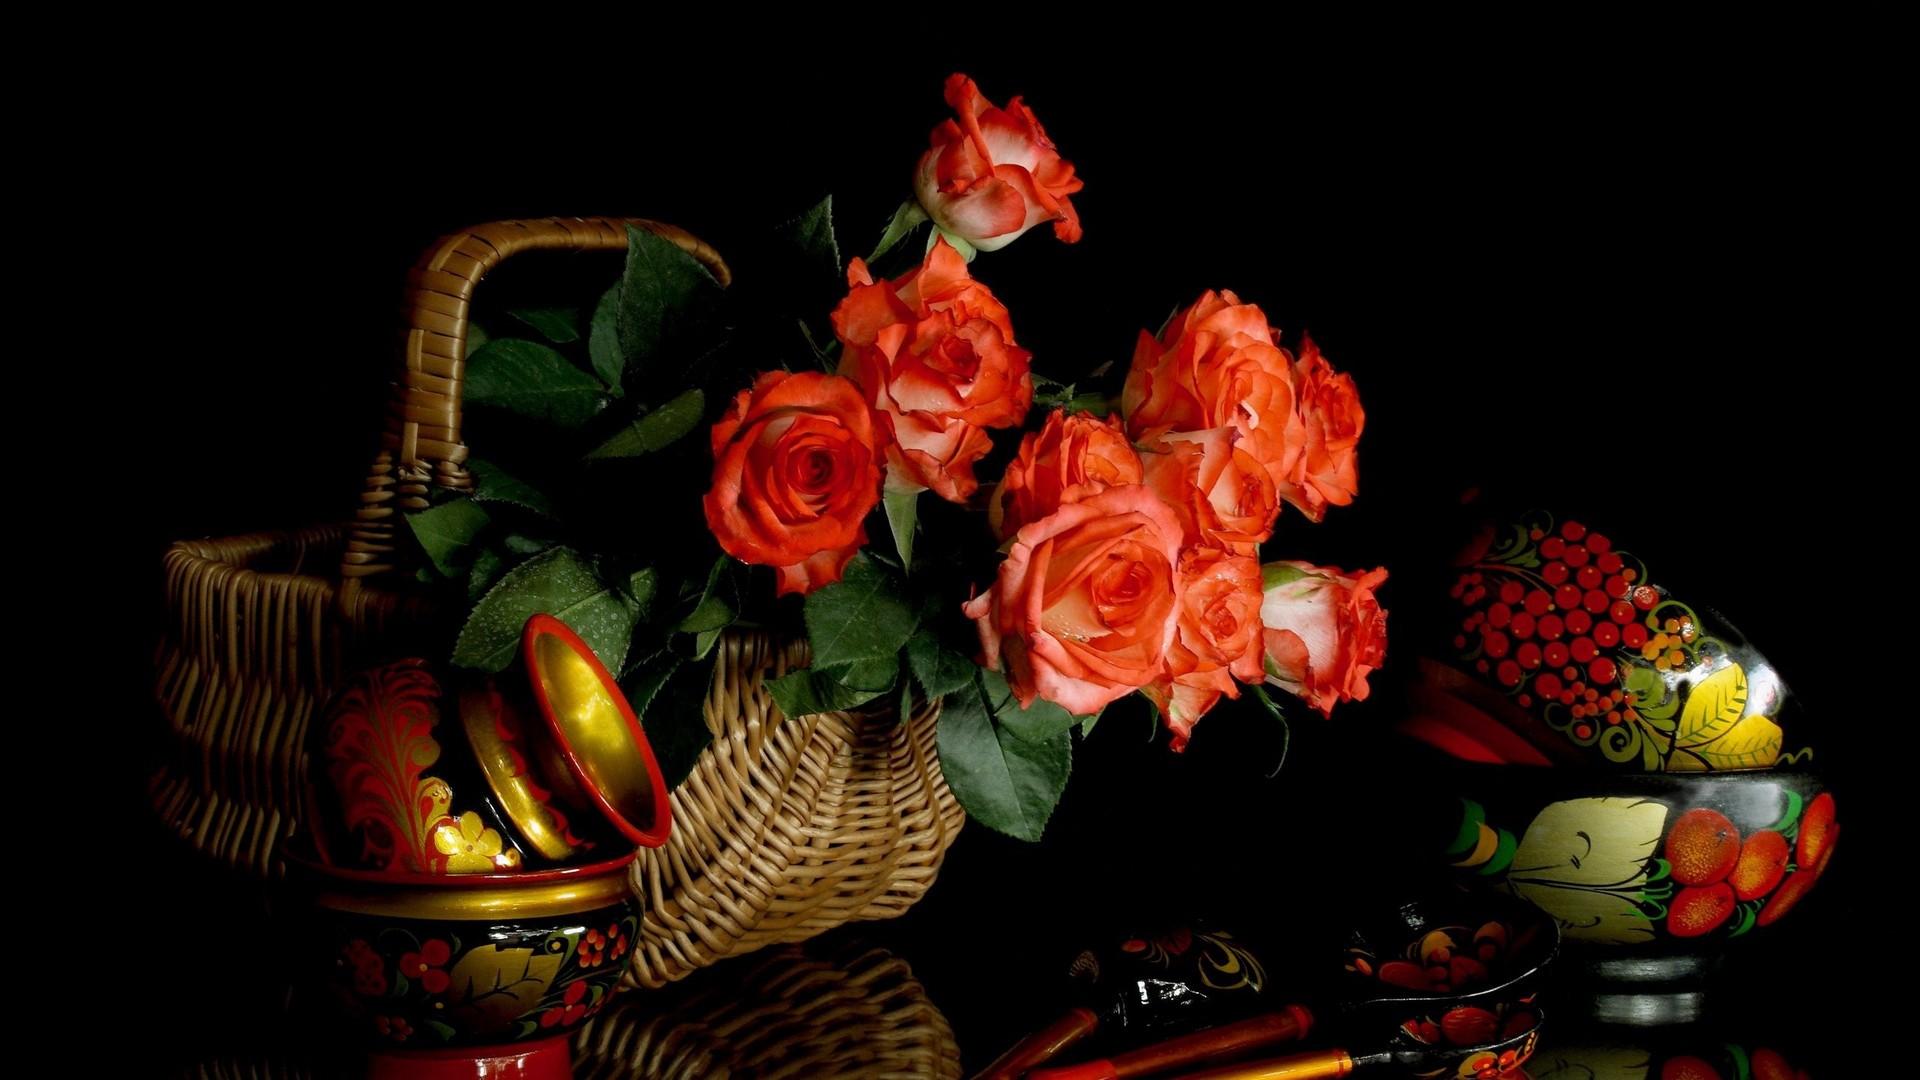 Nature Flowers Baskets Roses Black Background 1920 - Basket Of Flowers Hd , HD Wallpaper & Backgrounds